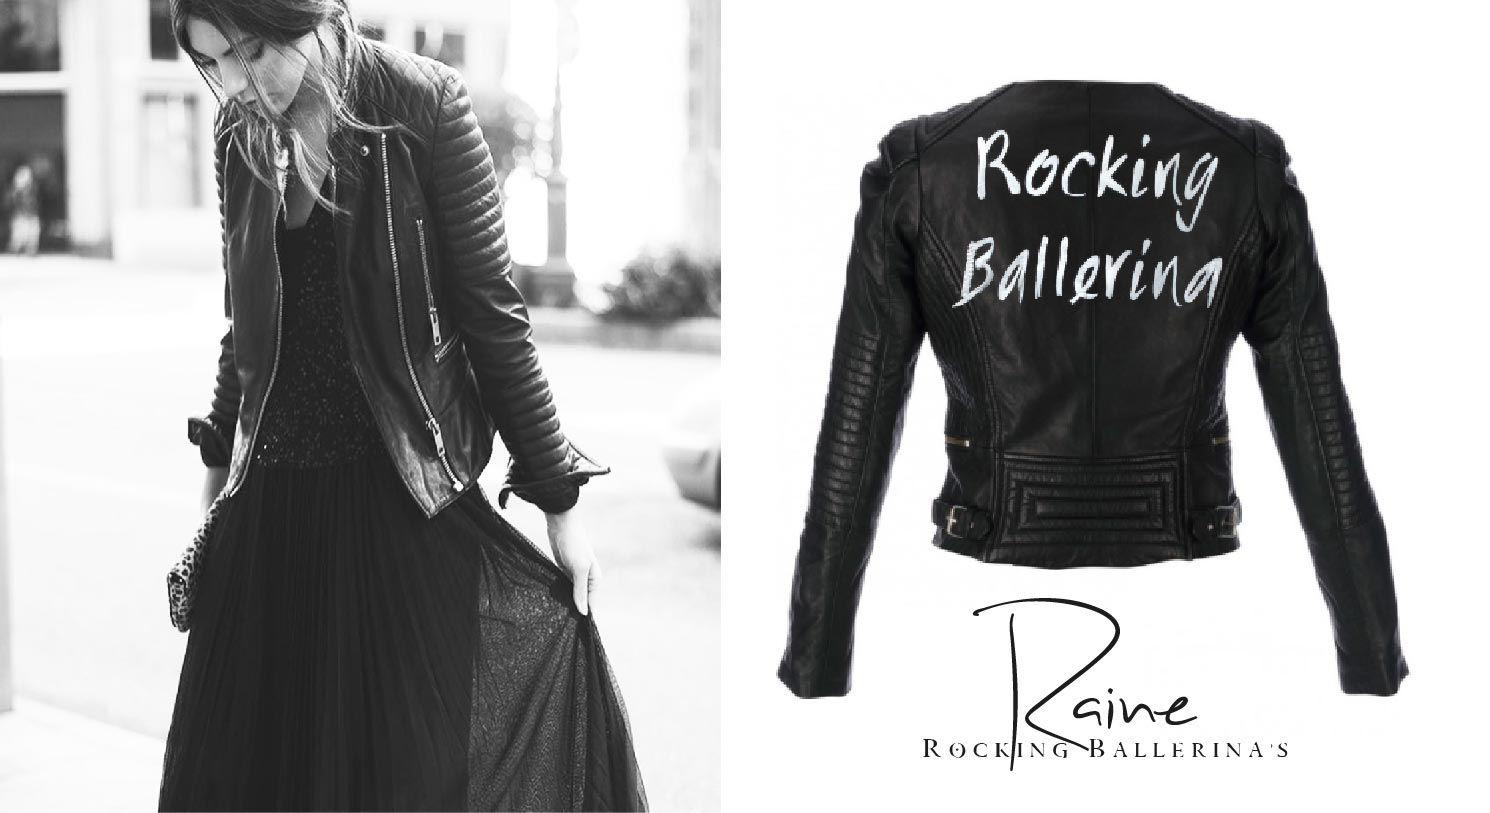 Raine Rocking Ballerina www.raine.nl